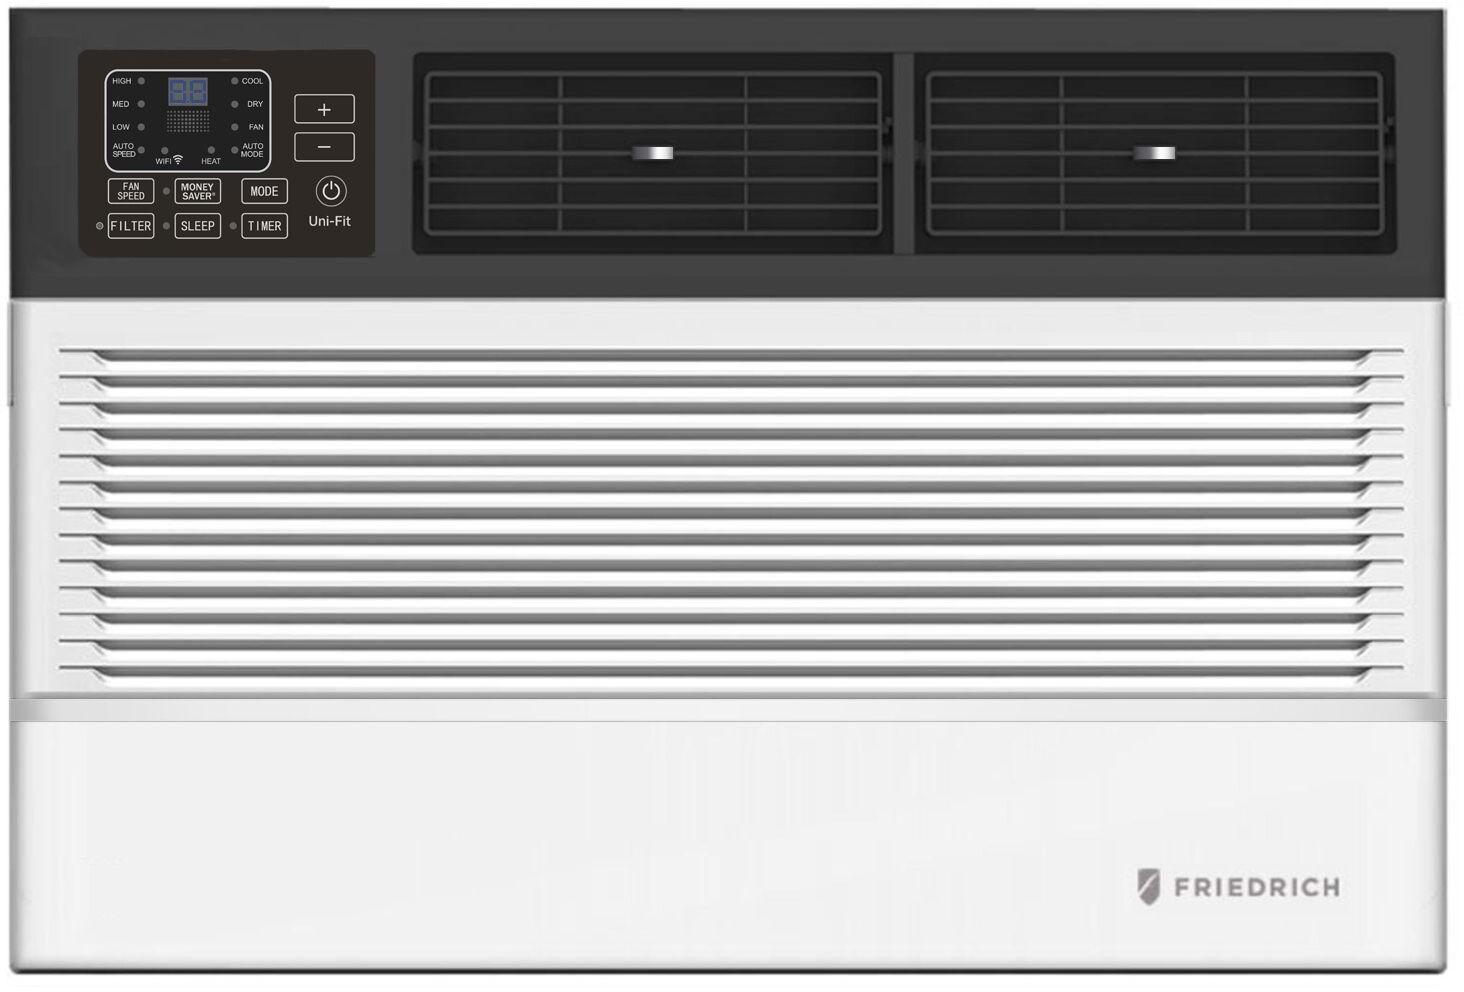 Friedrich Uni-Fit 10,000 BTU Wall Air Conditioner UCT10A30A